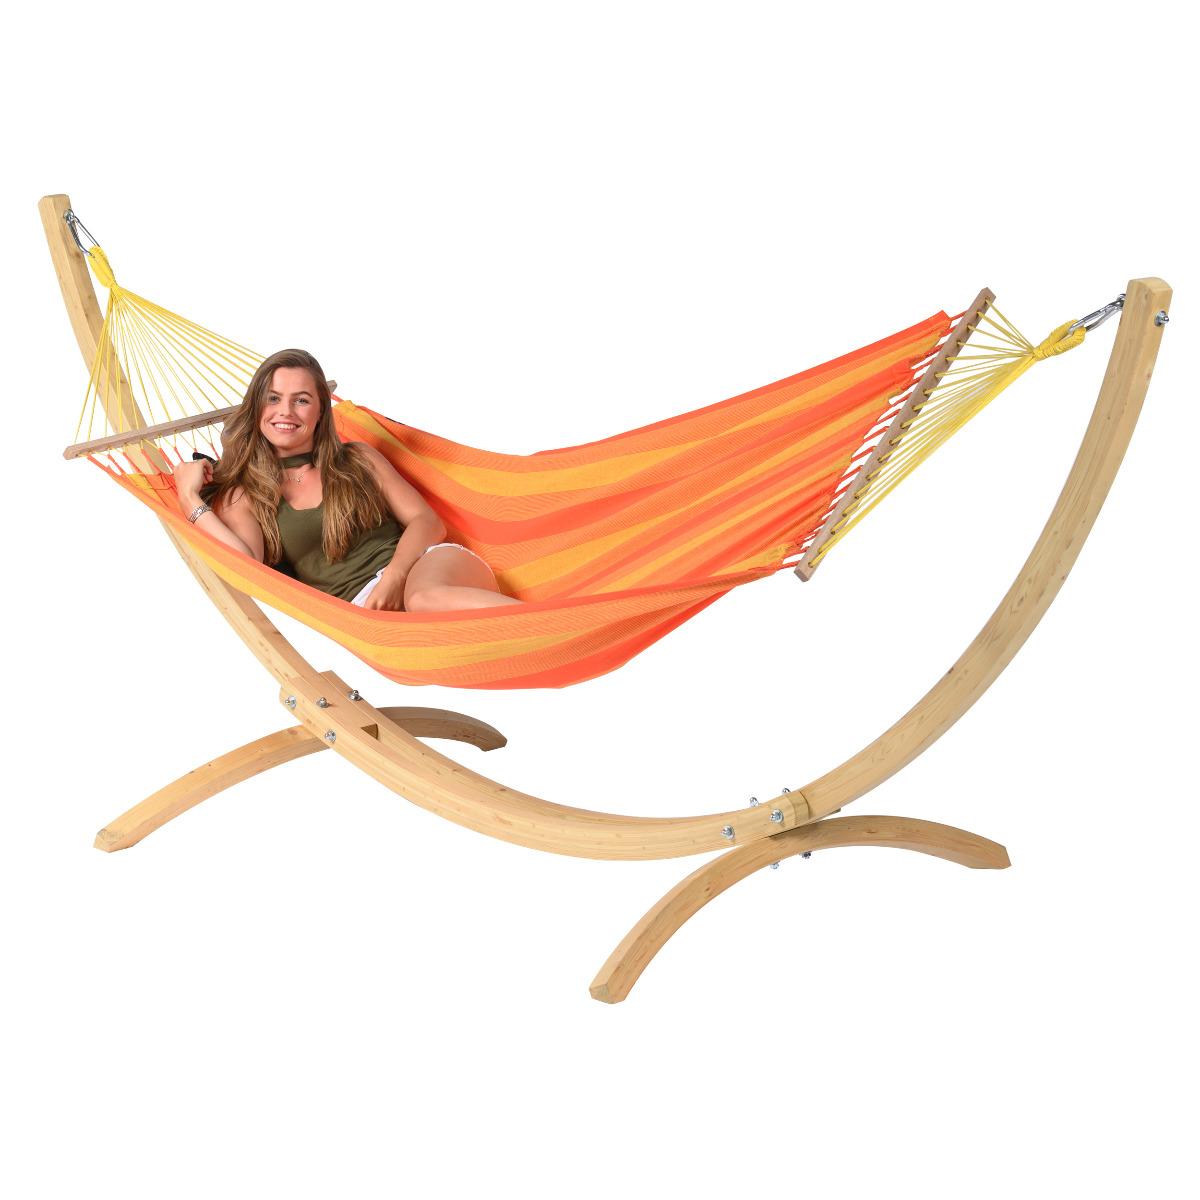 Hangmatset Single 'Wood & Relax' Orange - Tropilex �